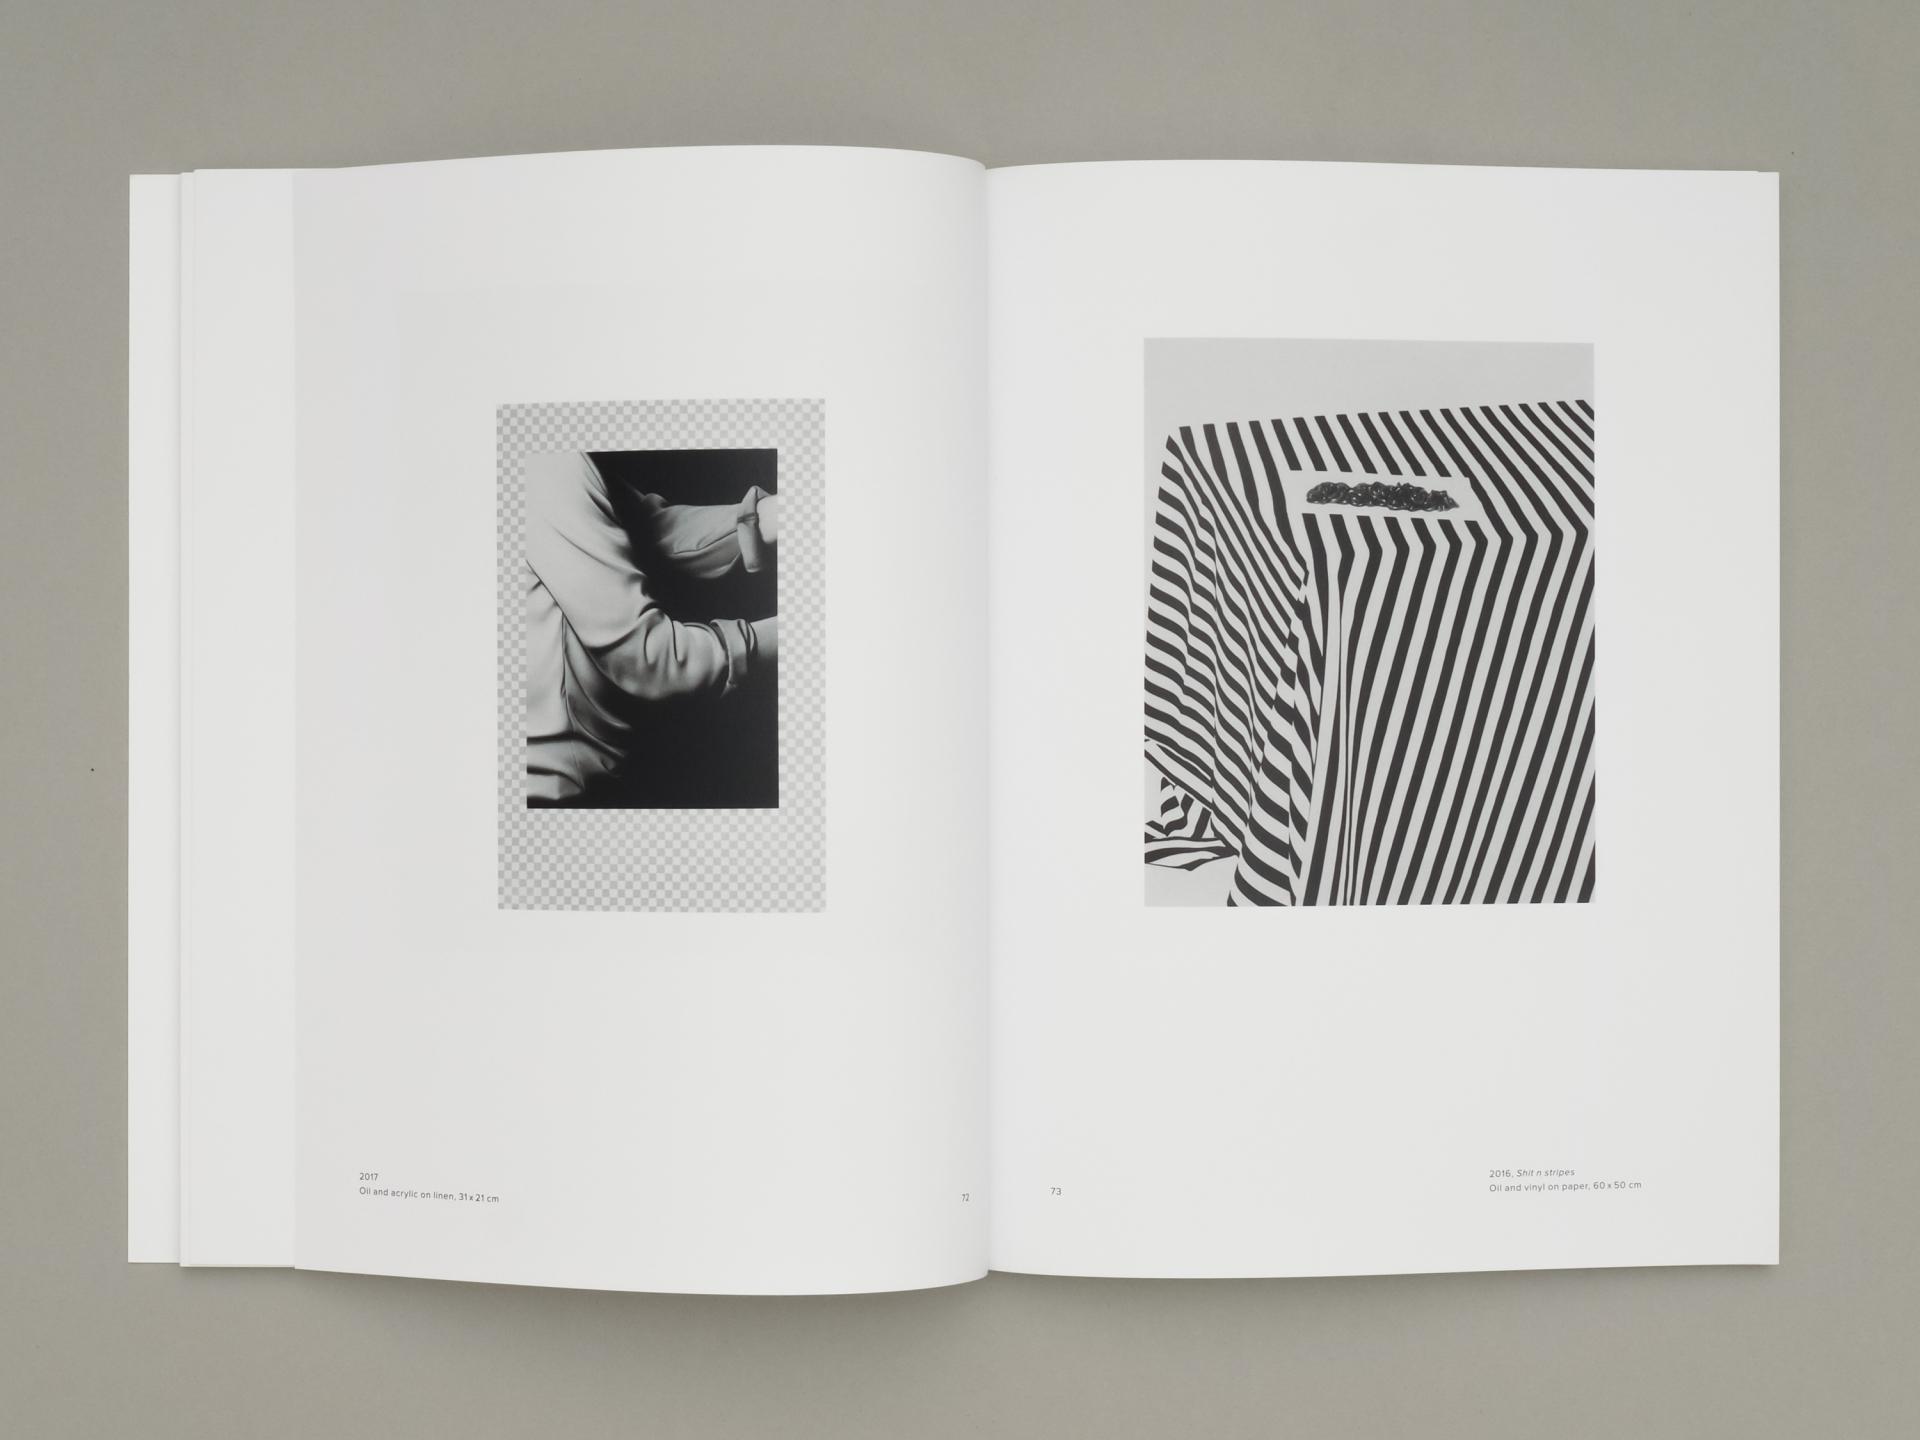 Grafikum Drago Persic artist catalogue